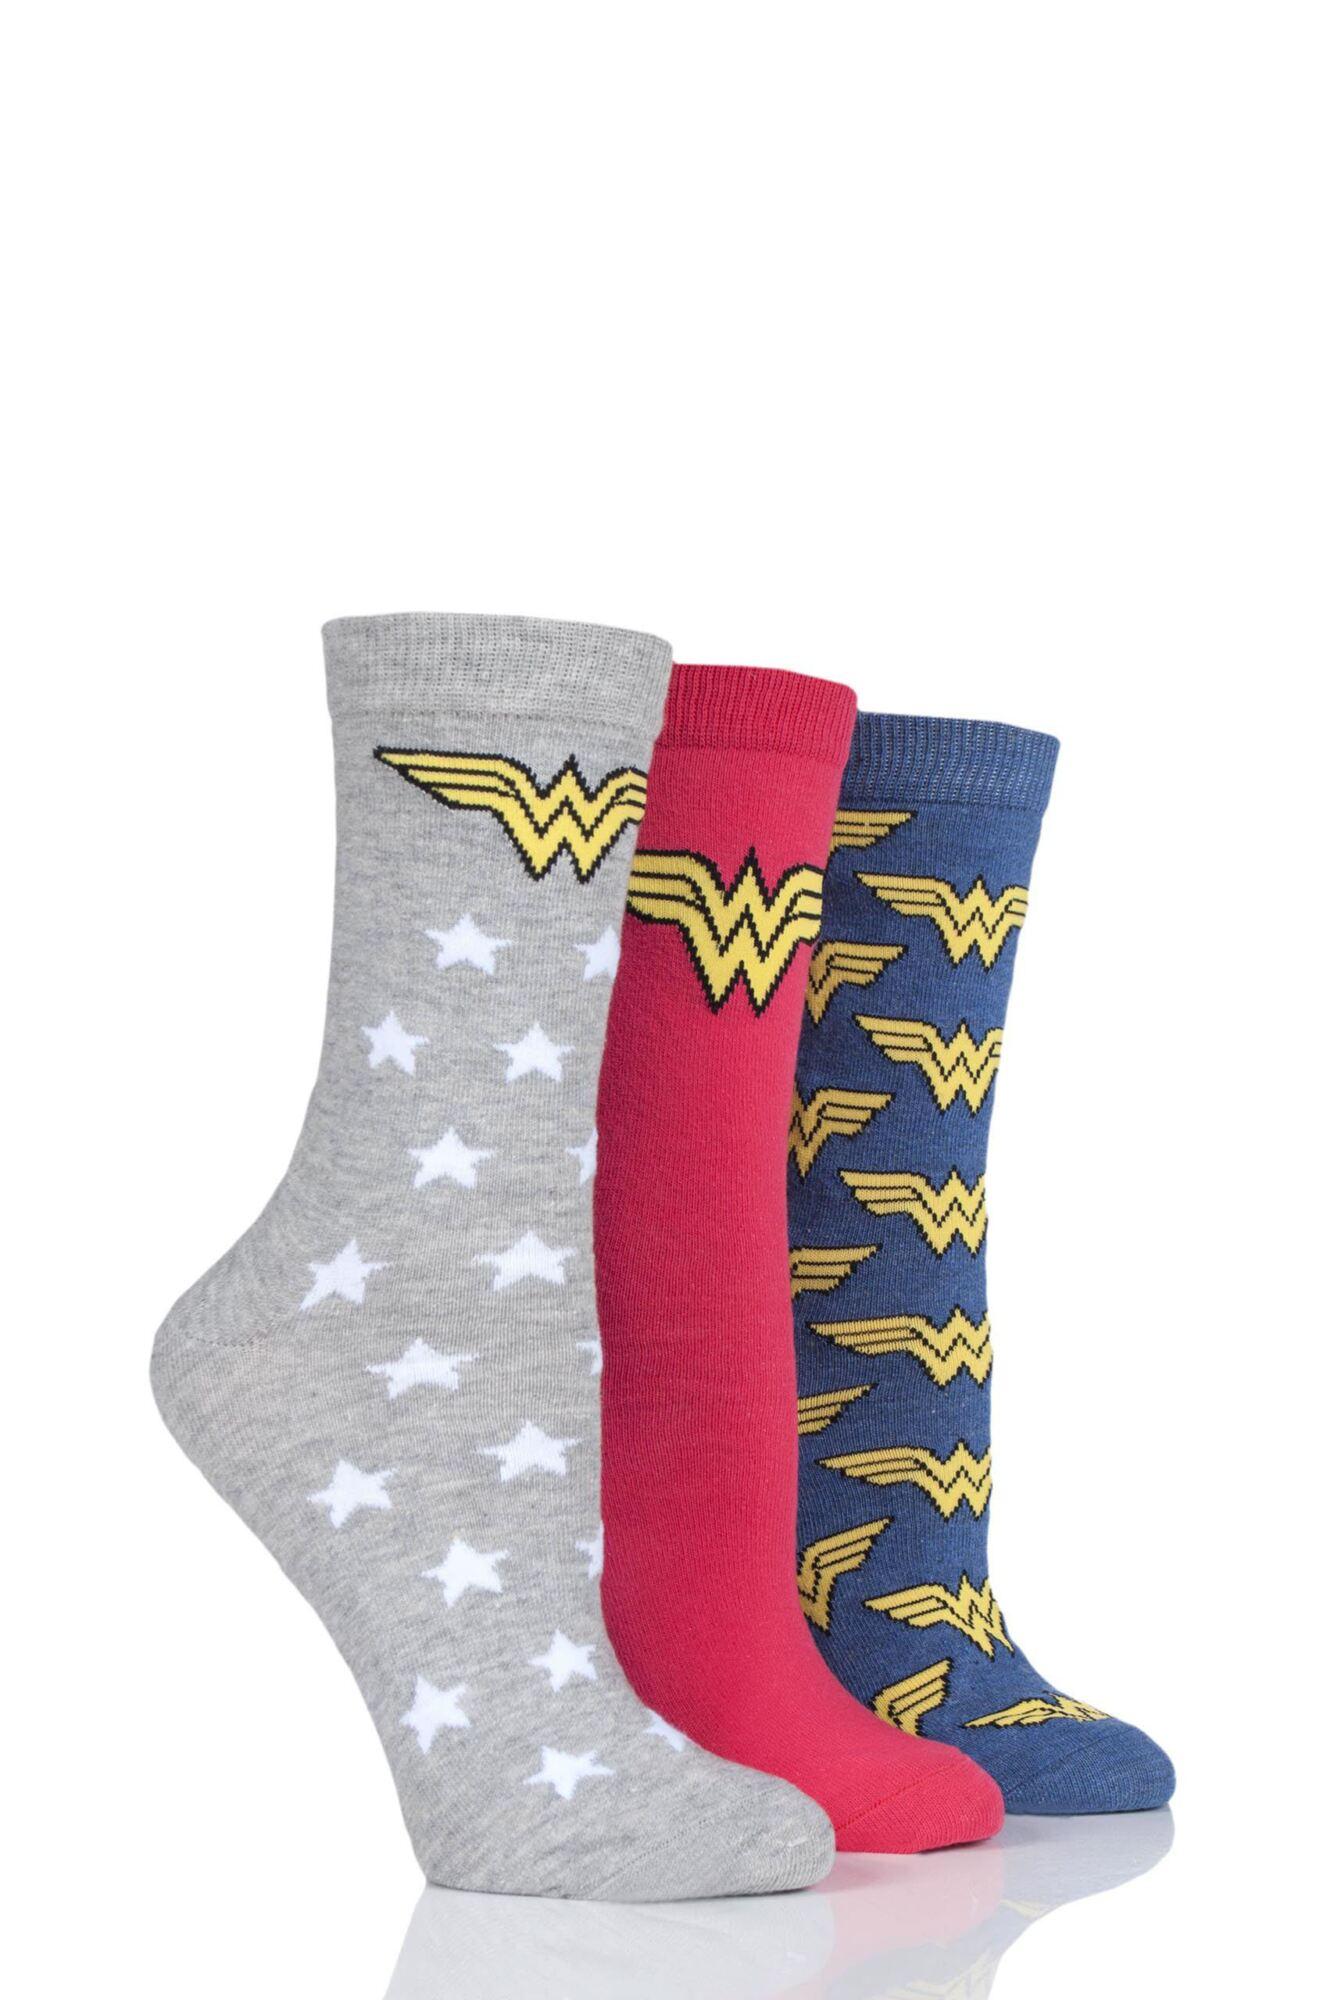 3 Pair Wonder Woman Logo Cotton Socks Ladies - Film & TV Characters